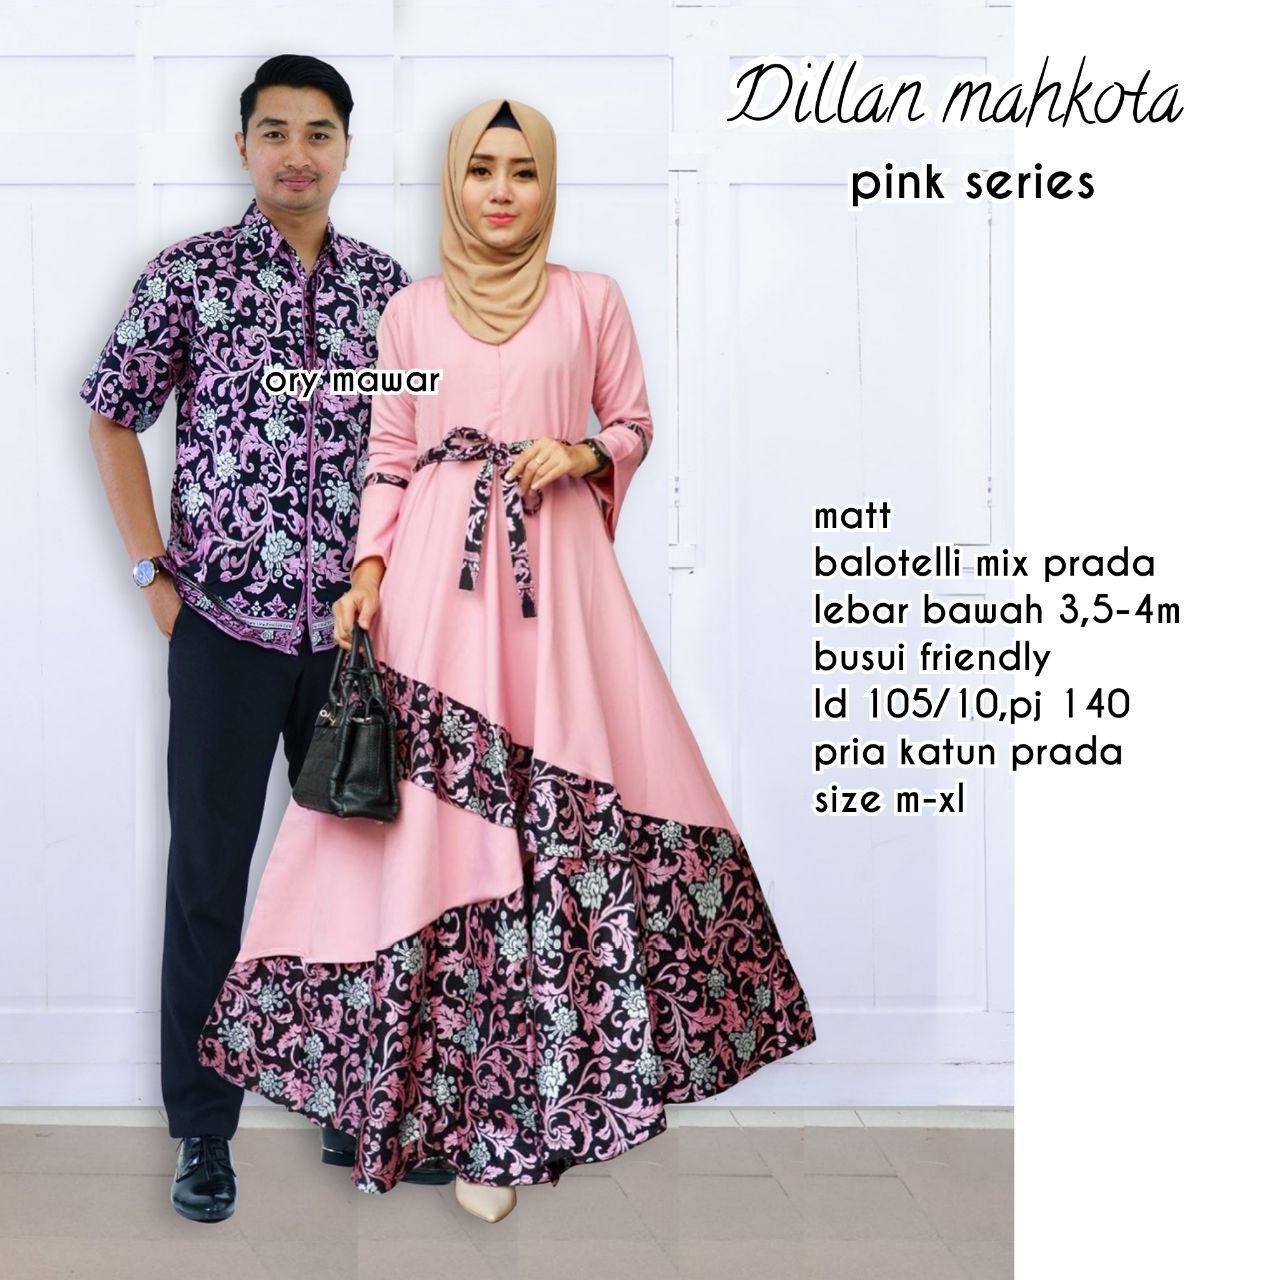 Batik Couple / Batik Sarimbit / Batik Keluarga - Dillan Mahkota